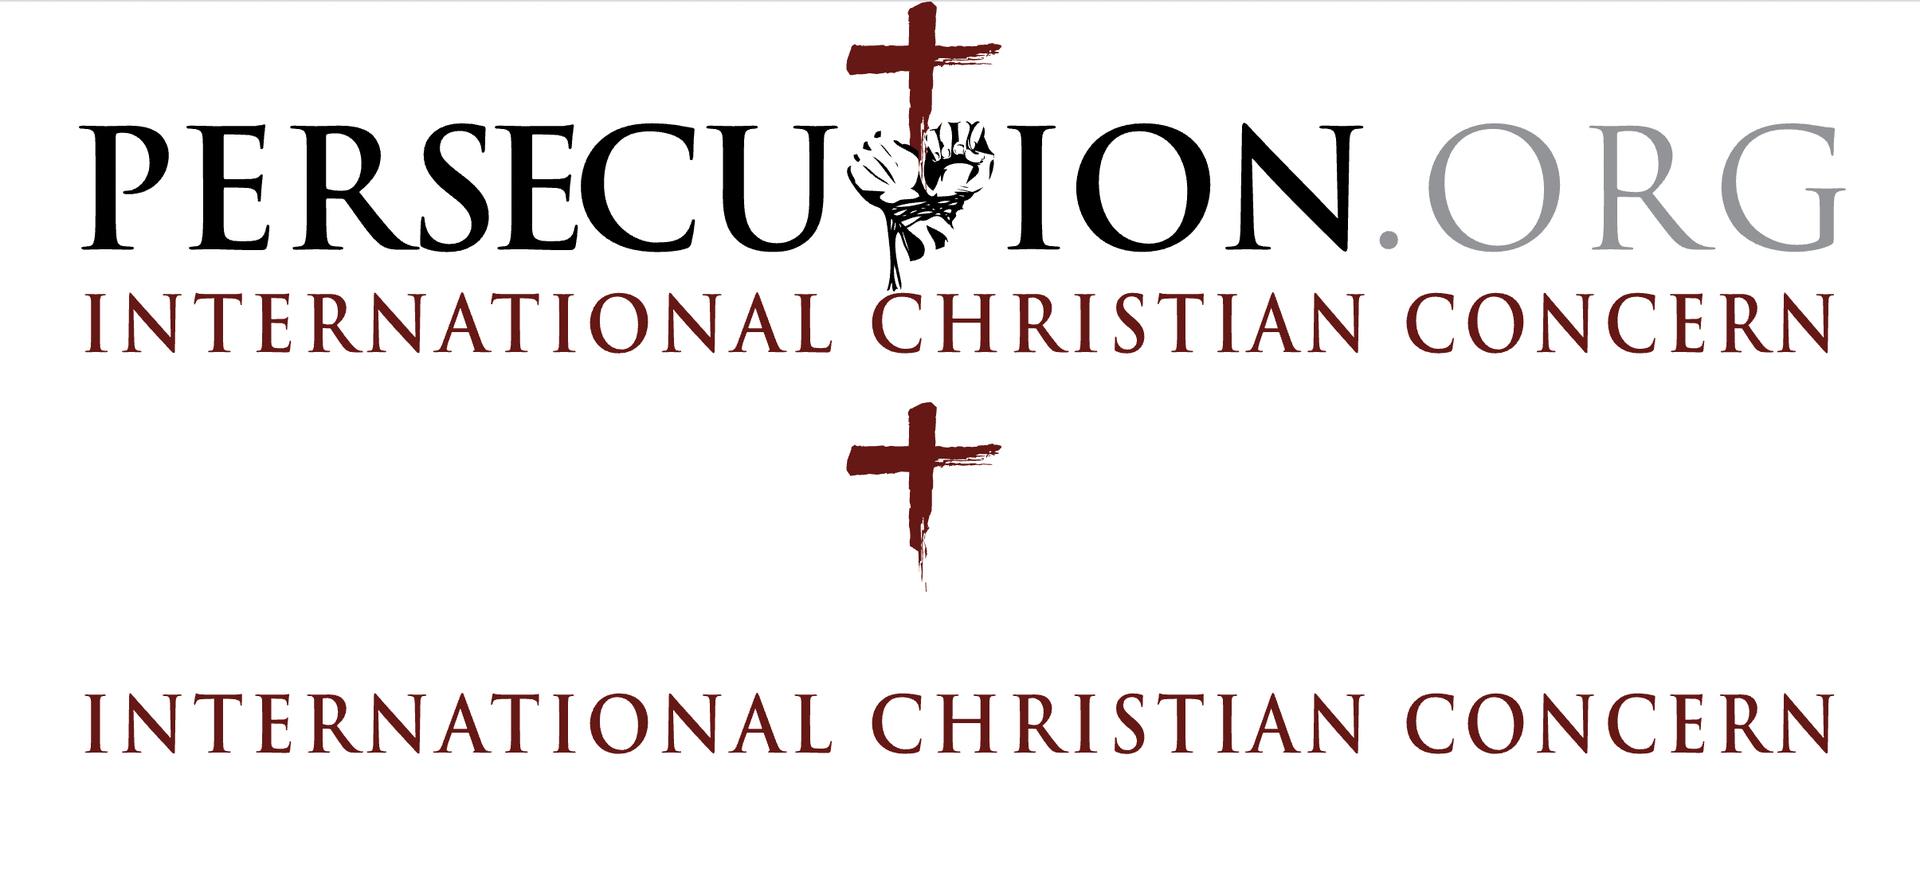 International Christian Concern